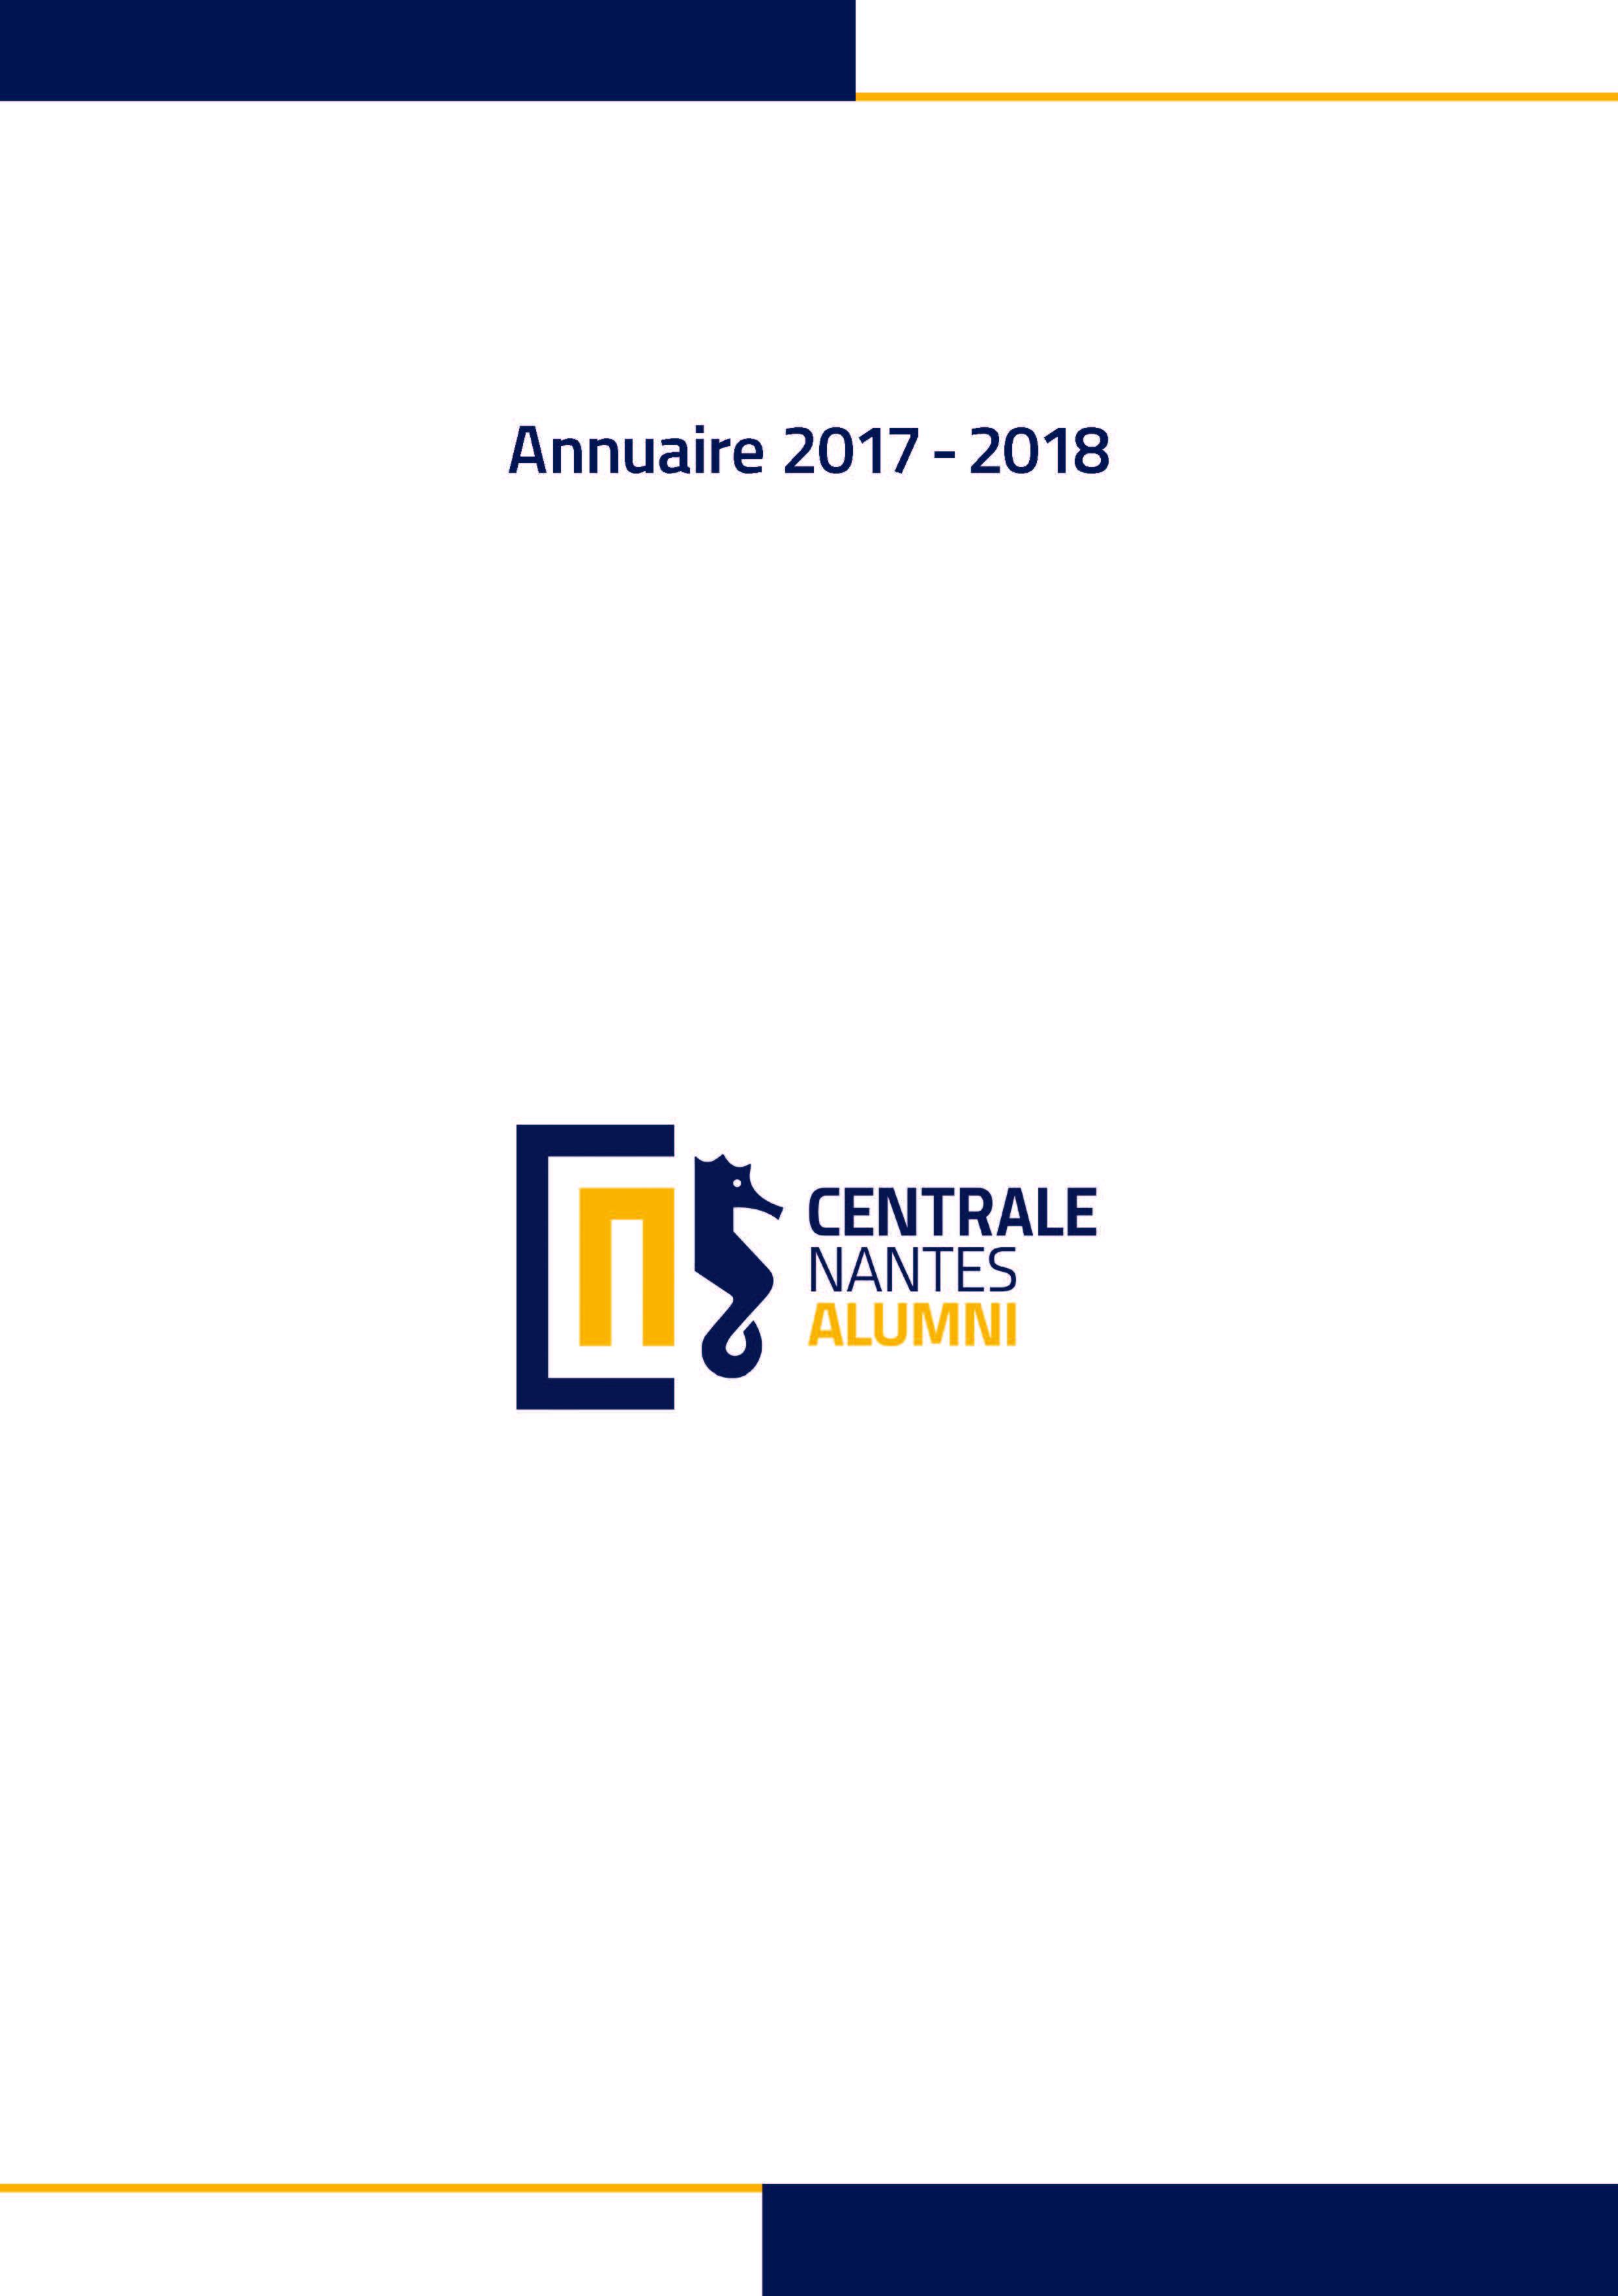 annuaire2017